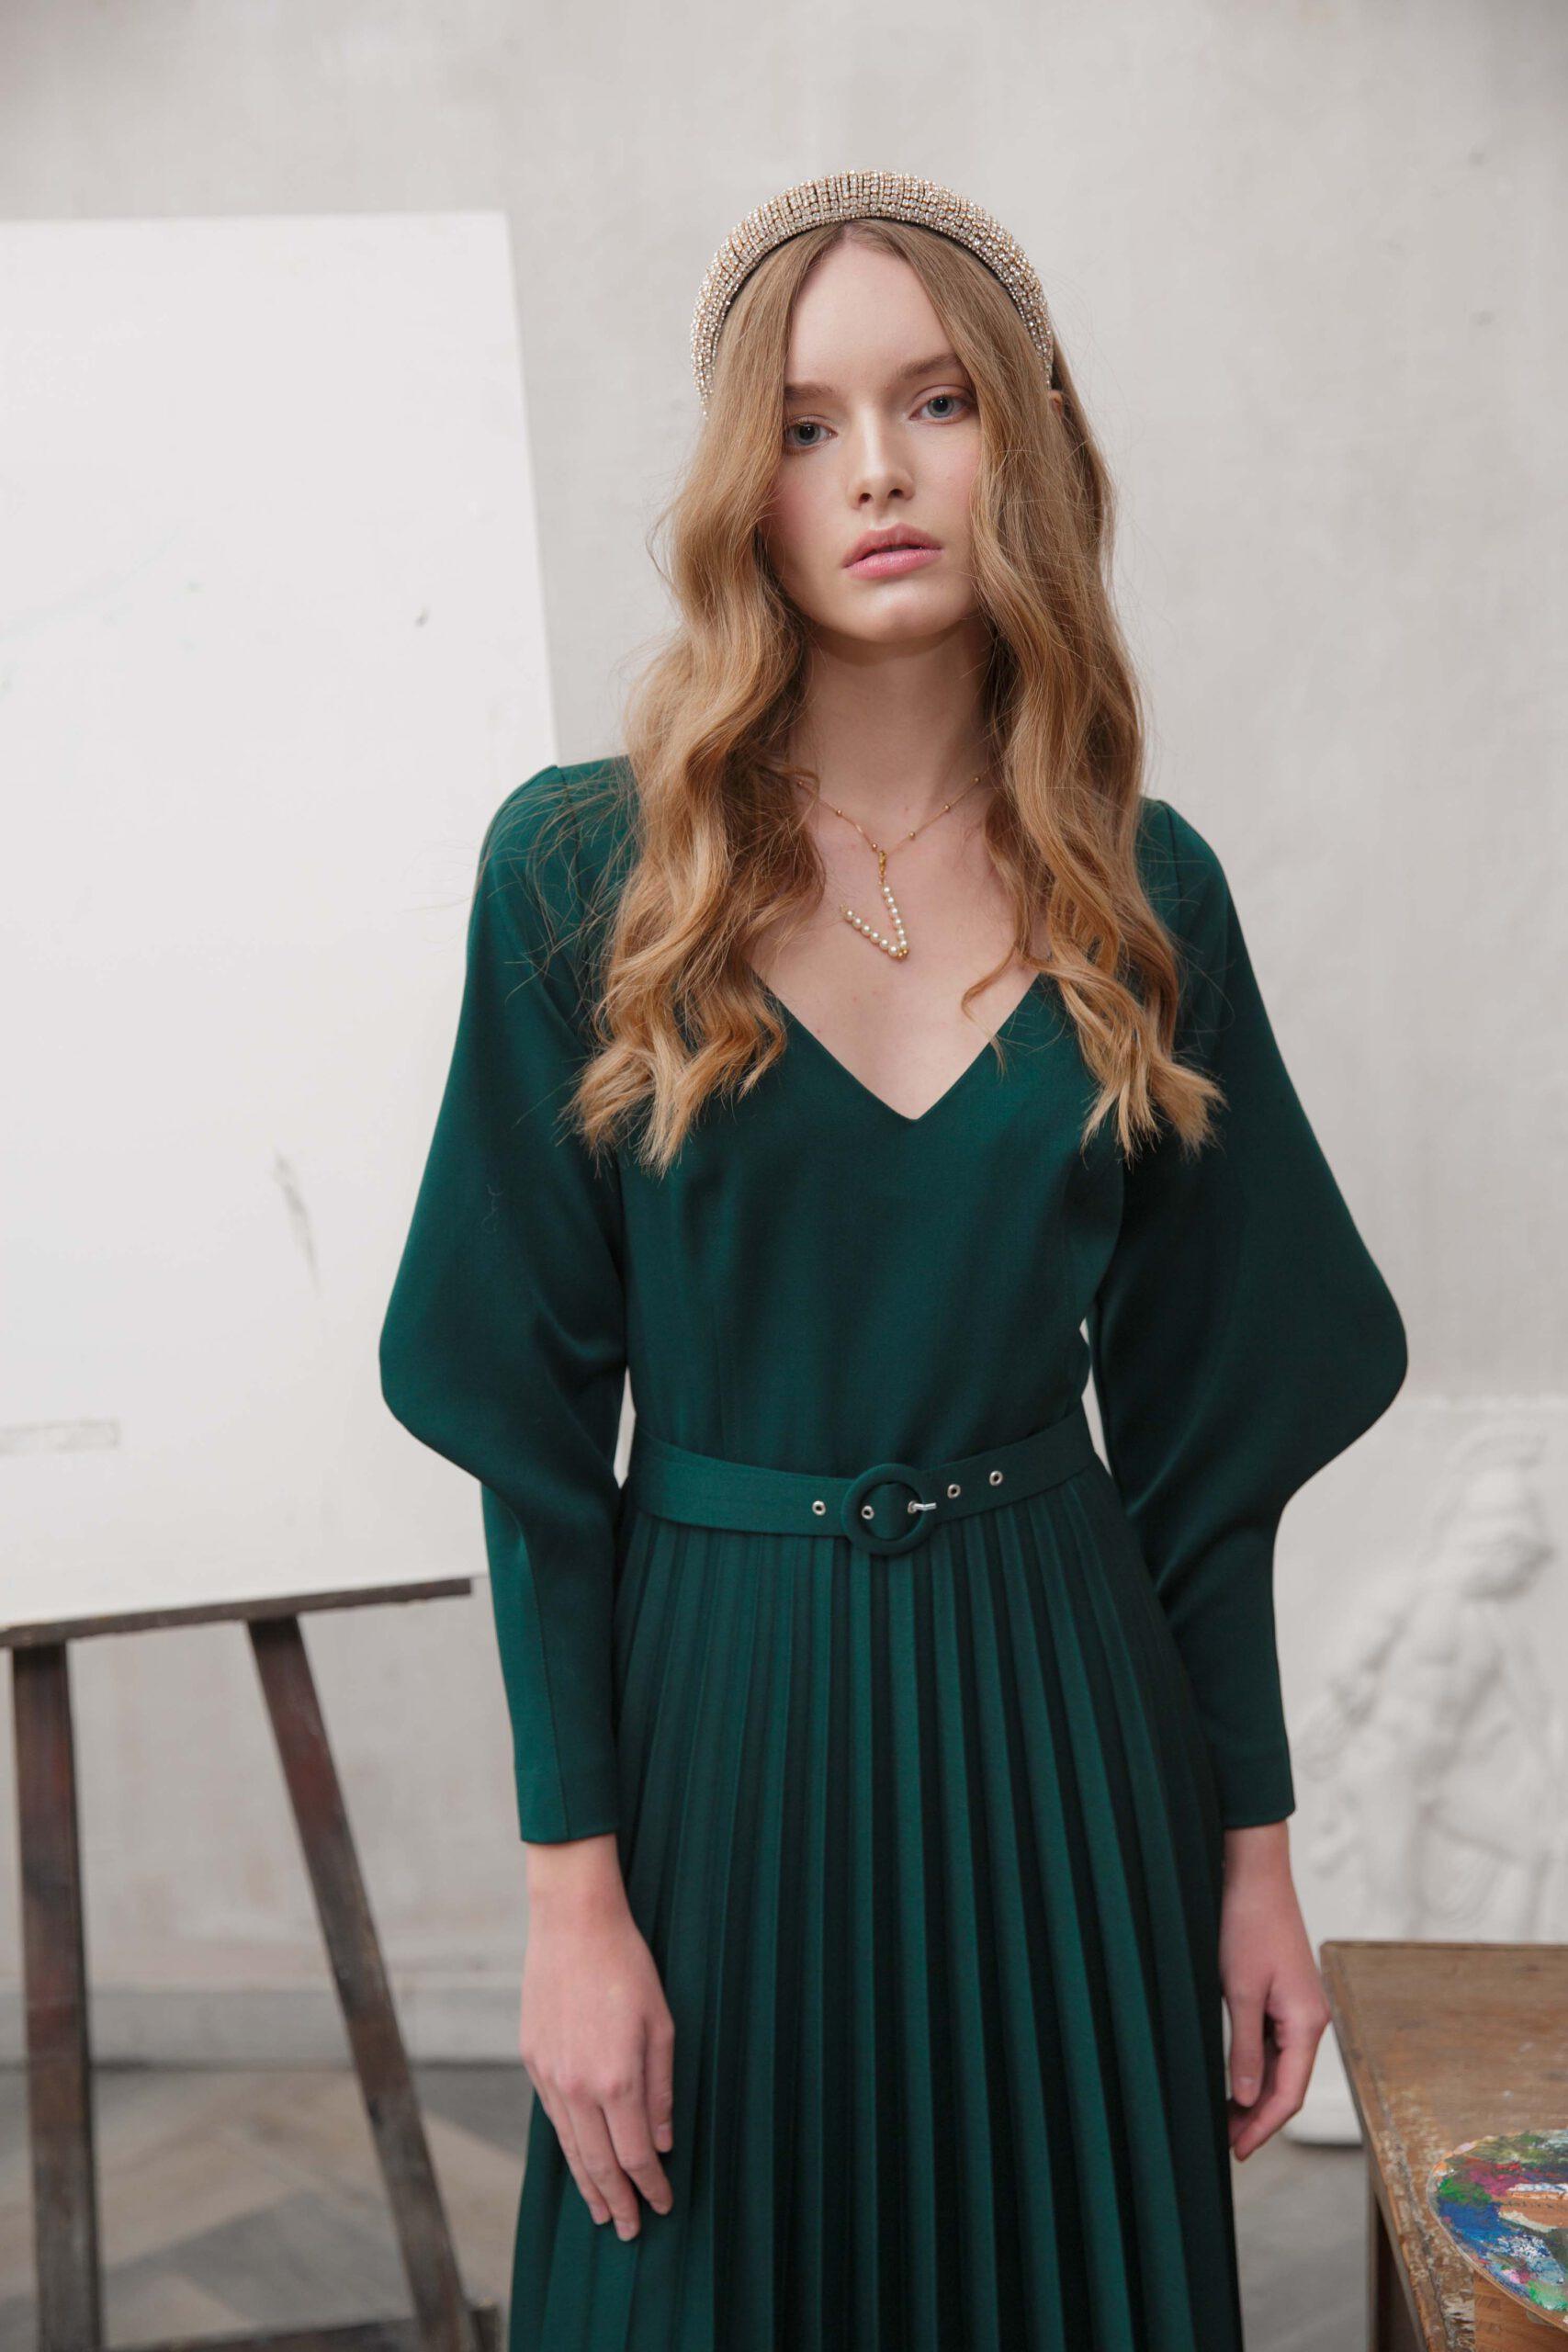 Drapiertes Grünes Kleid › Sashkaproject